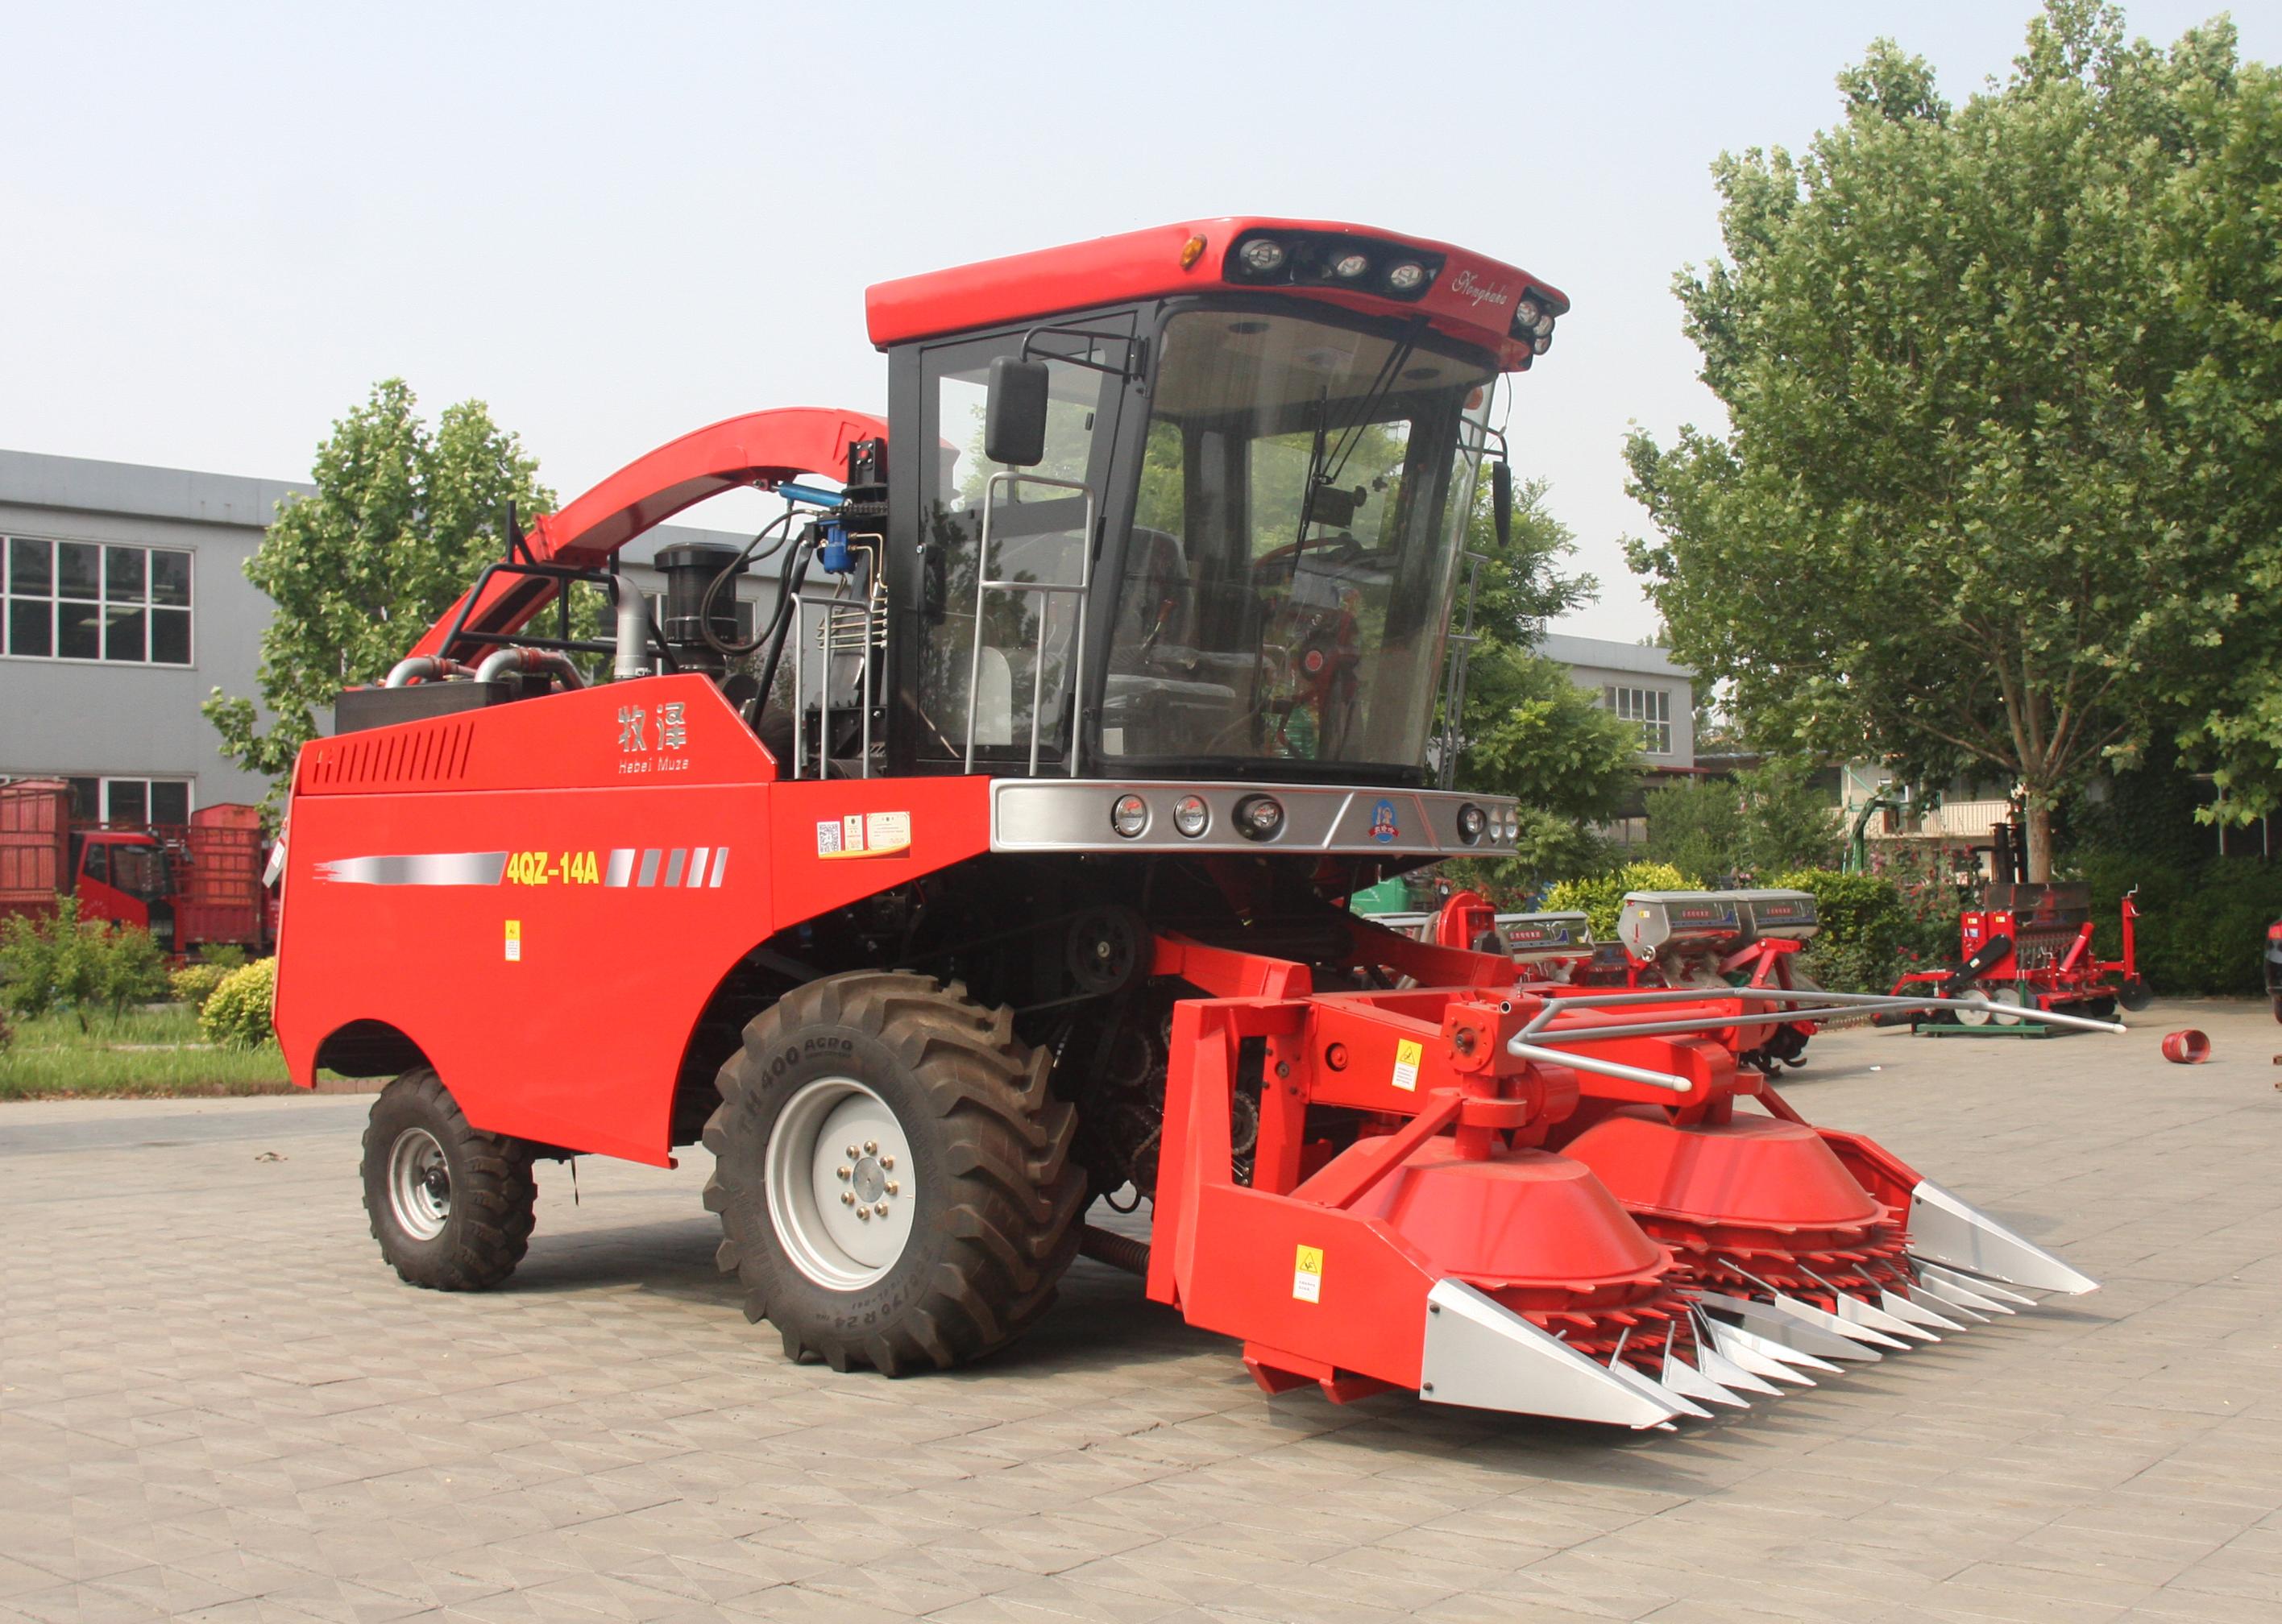 4QZ-14A青饲料收获机 籽粒破碎青贮机